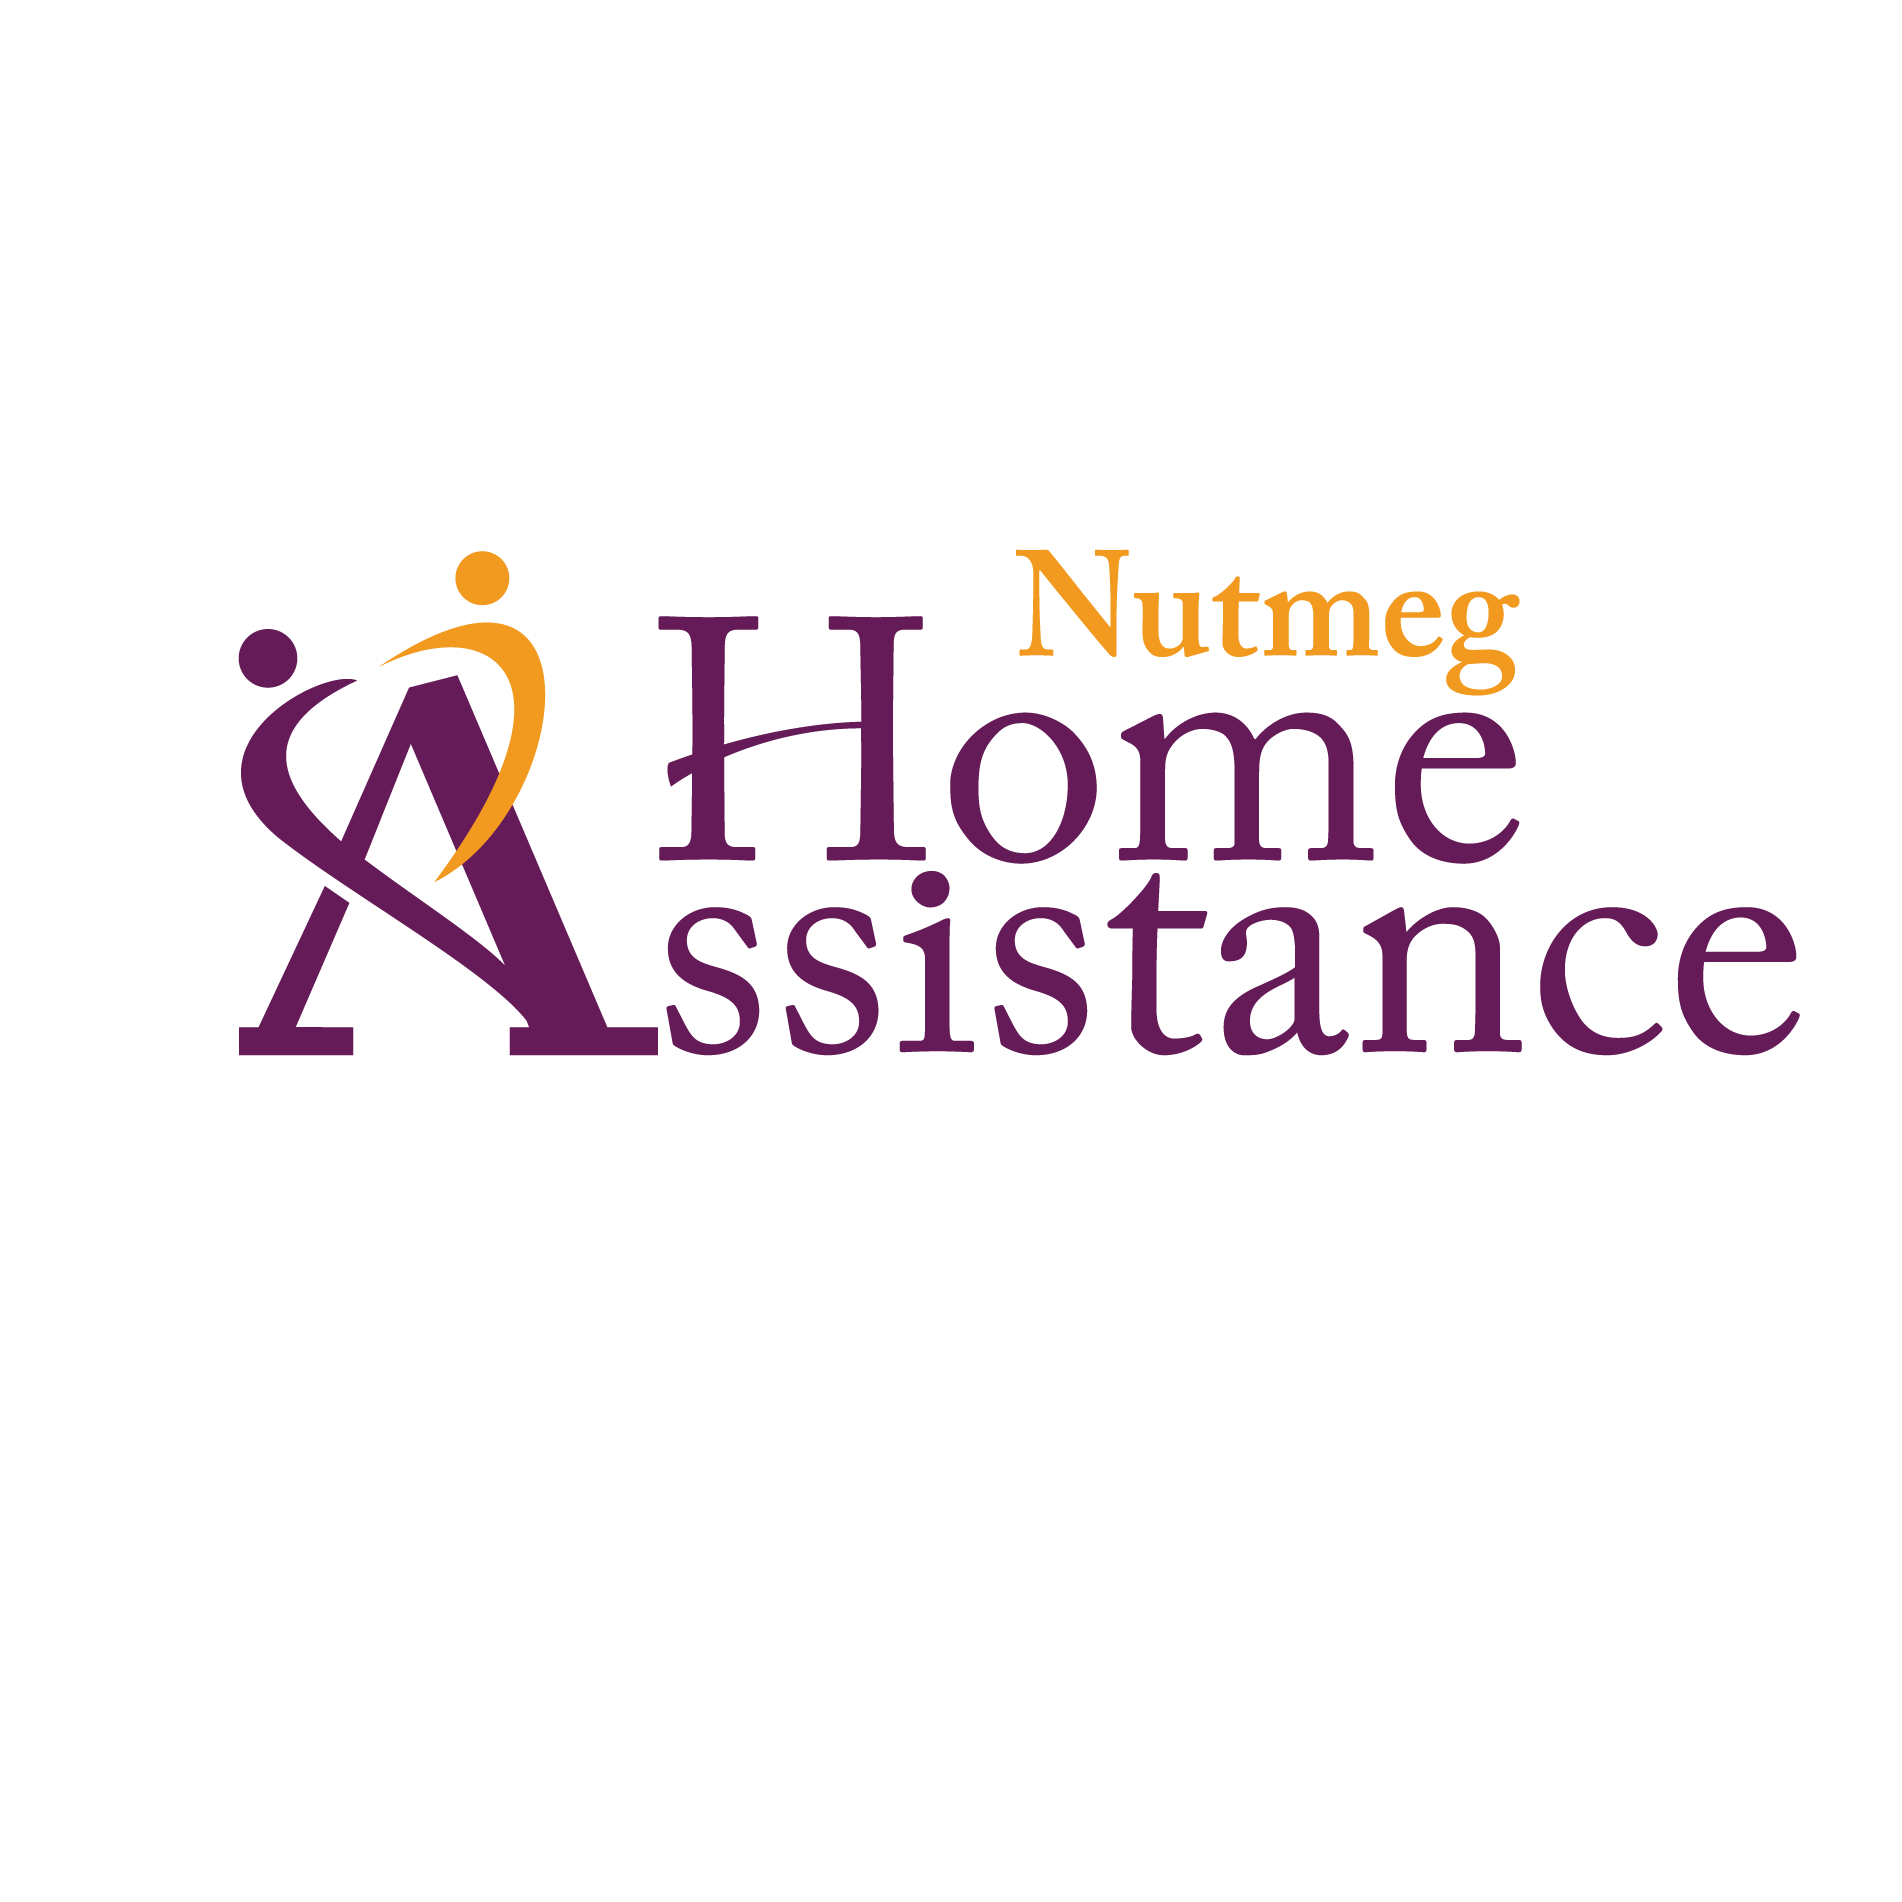 Nutmeg Home Assistance